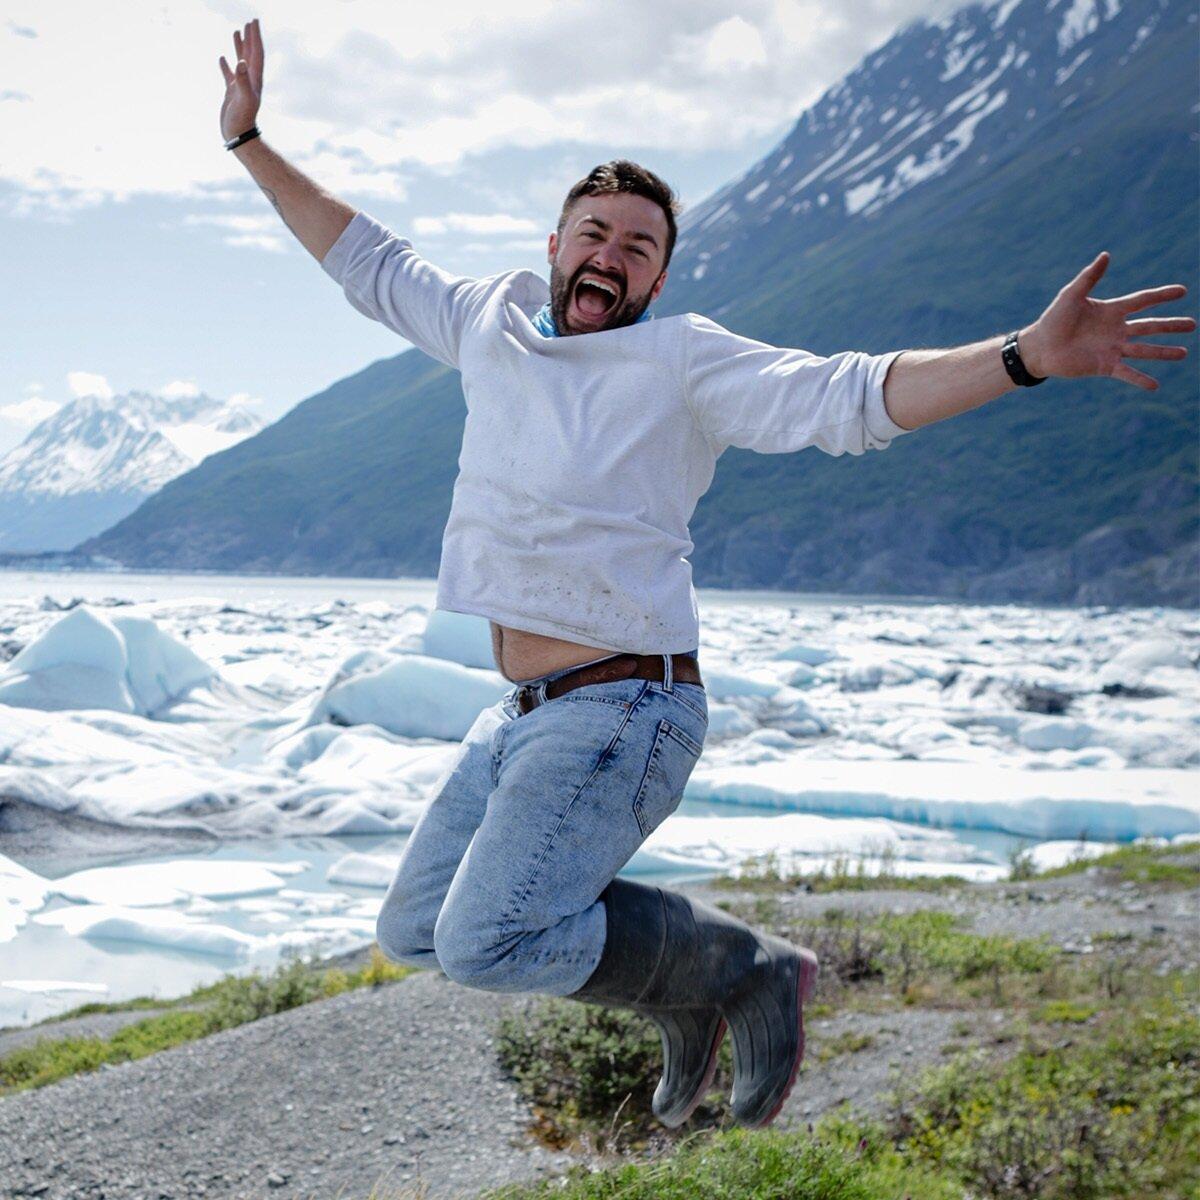 dan-redfield-alaska-photoventures-adventure-photographer-anchorage-based-2.jpg